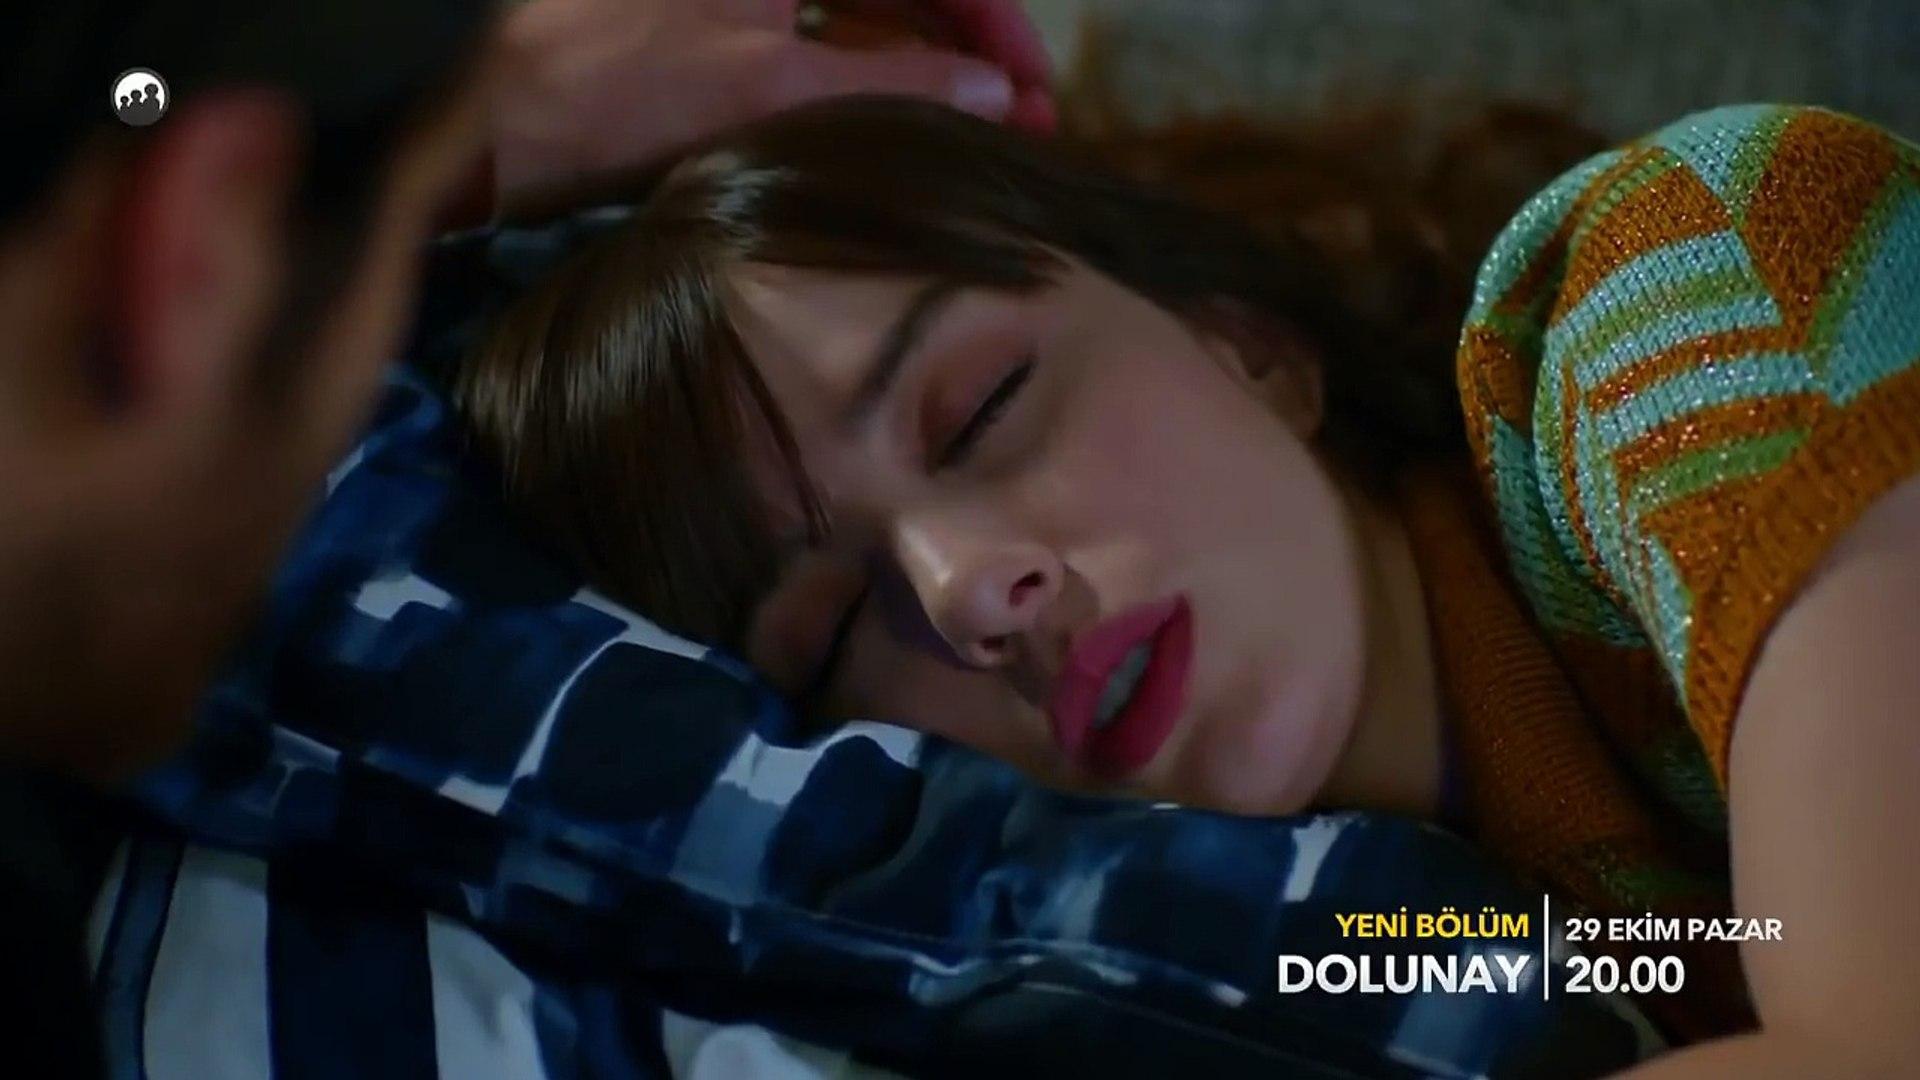 Dolunay / Full Moon Trailer - Episode 17 (Eng & Tur Subs)